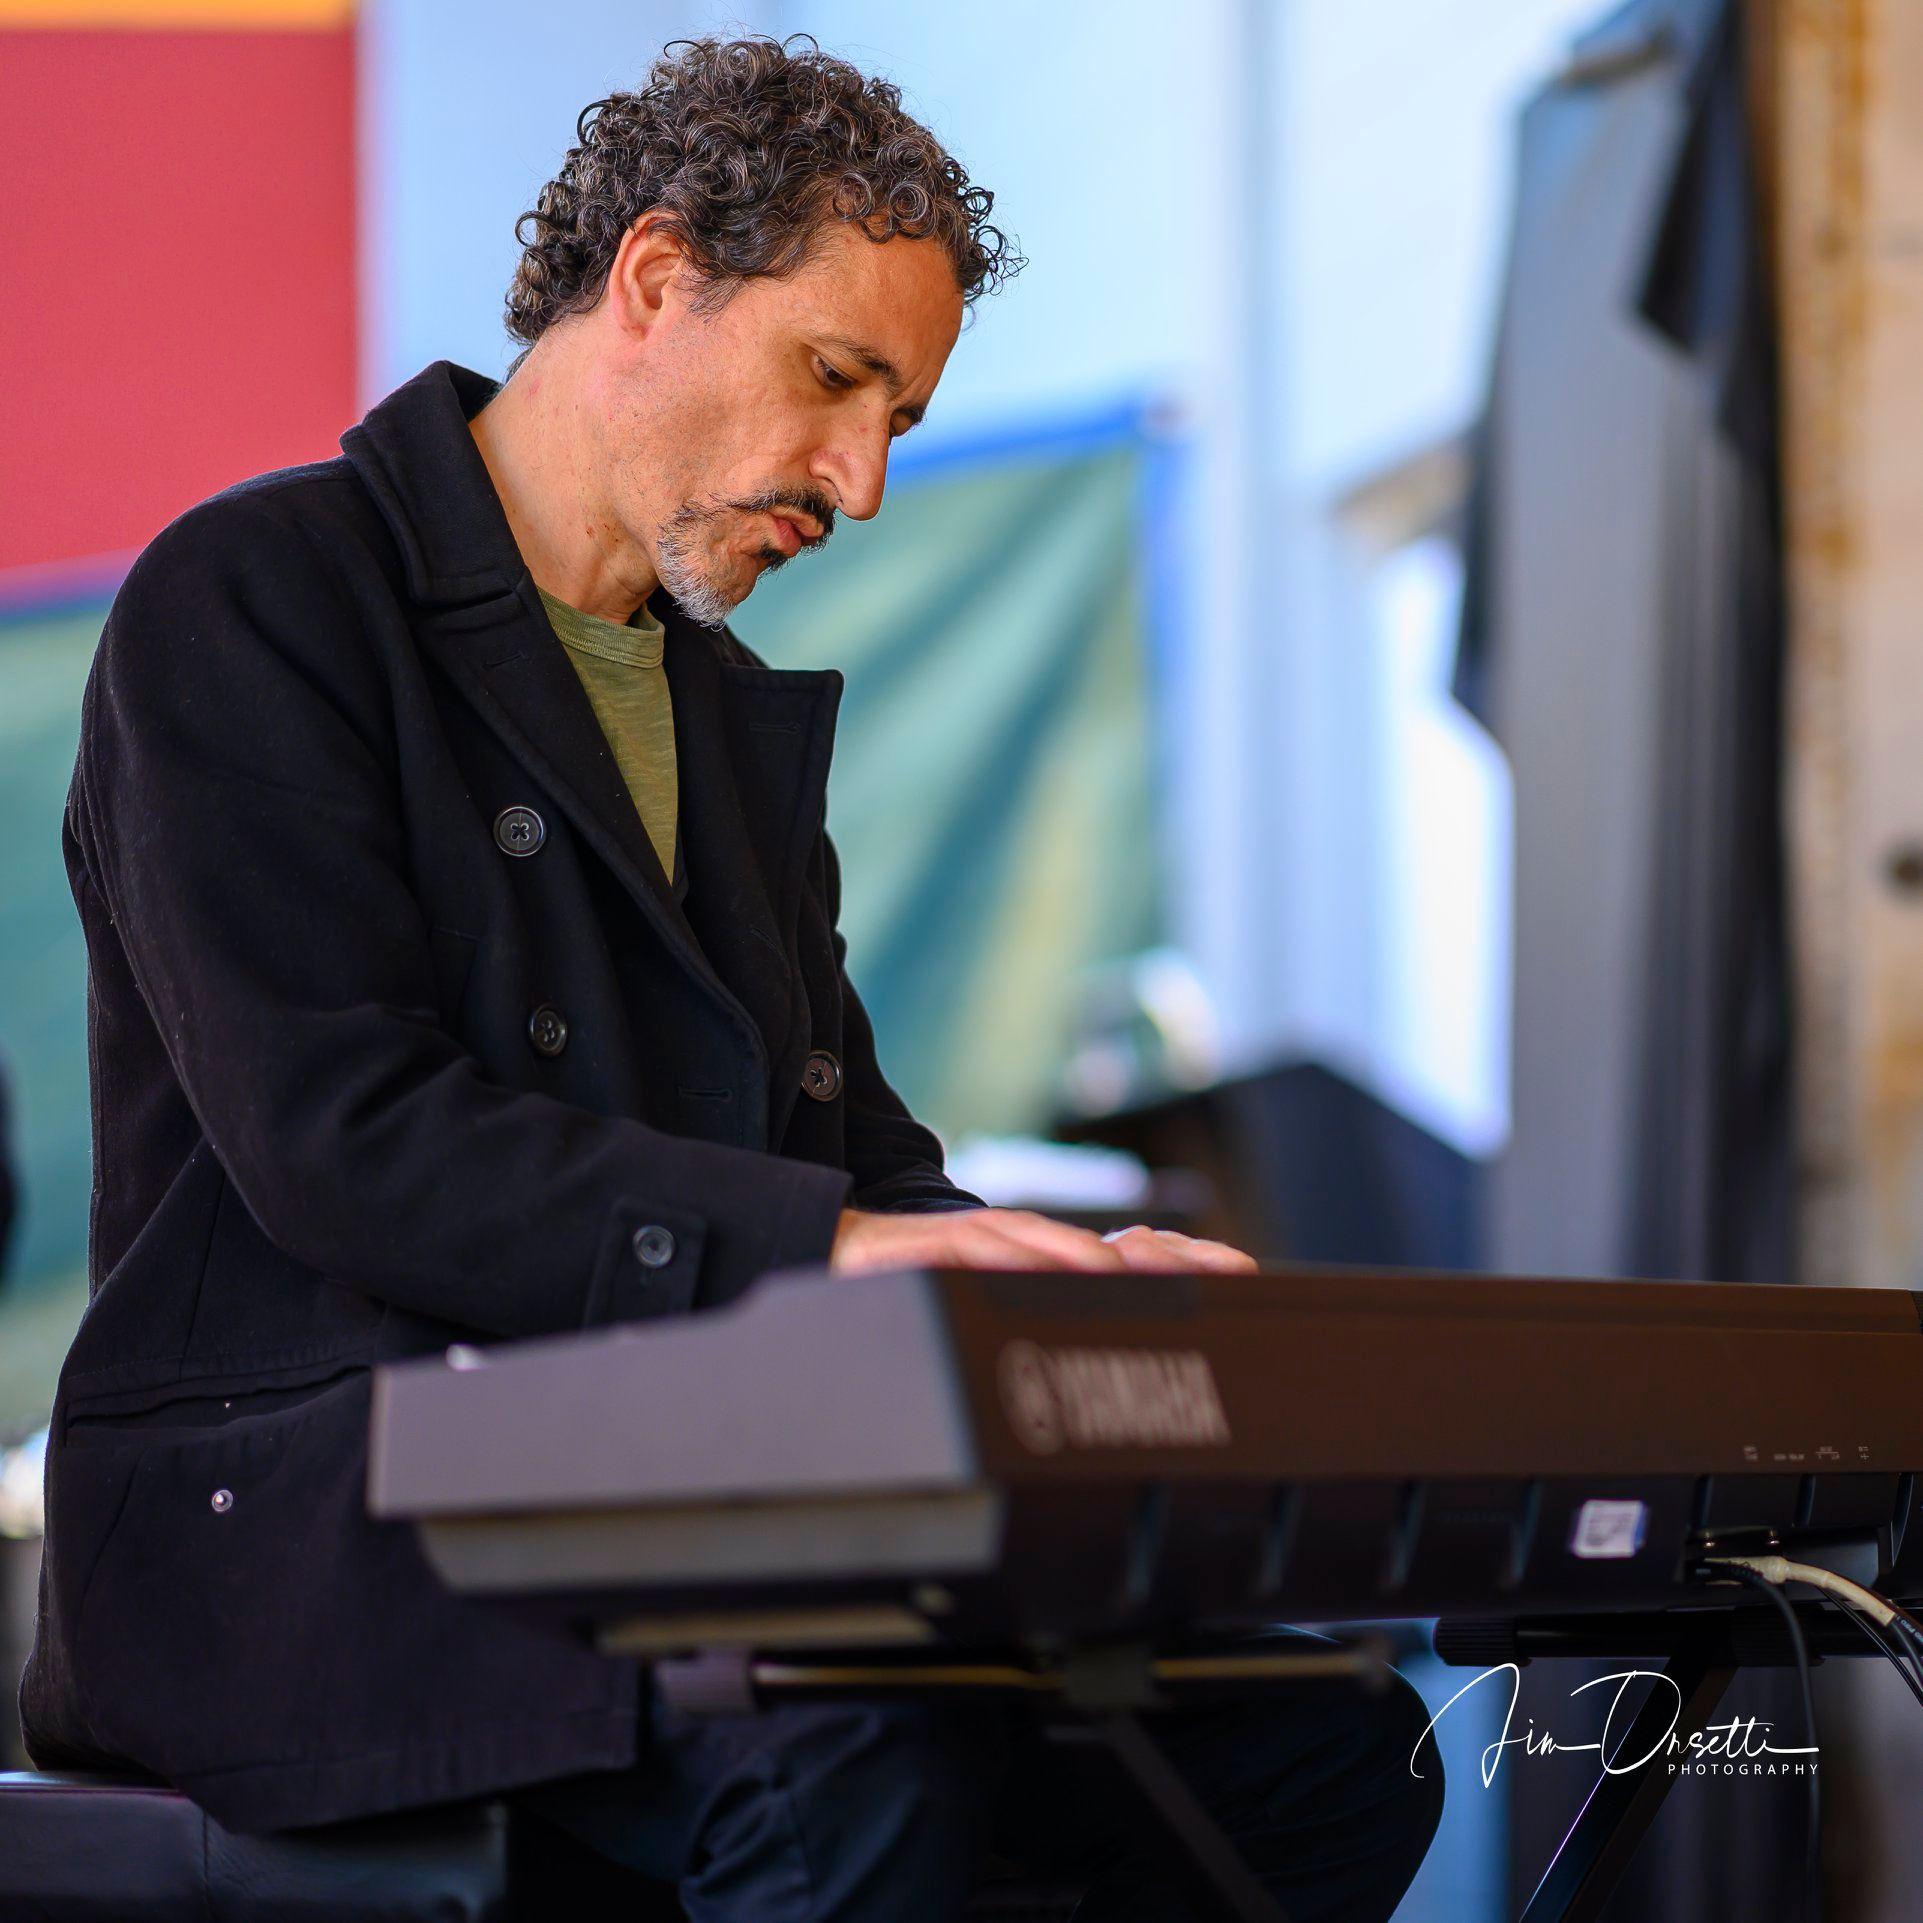 Matt Clark at the 2nd Annual 7 Mile House Jazz Fest 2019